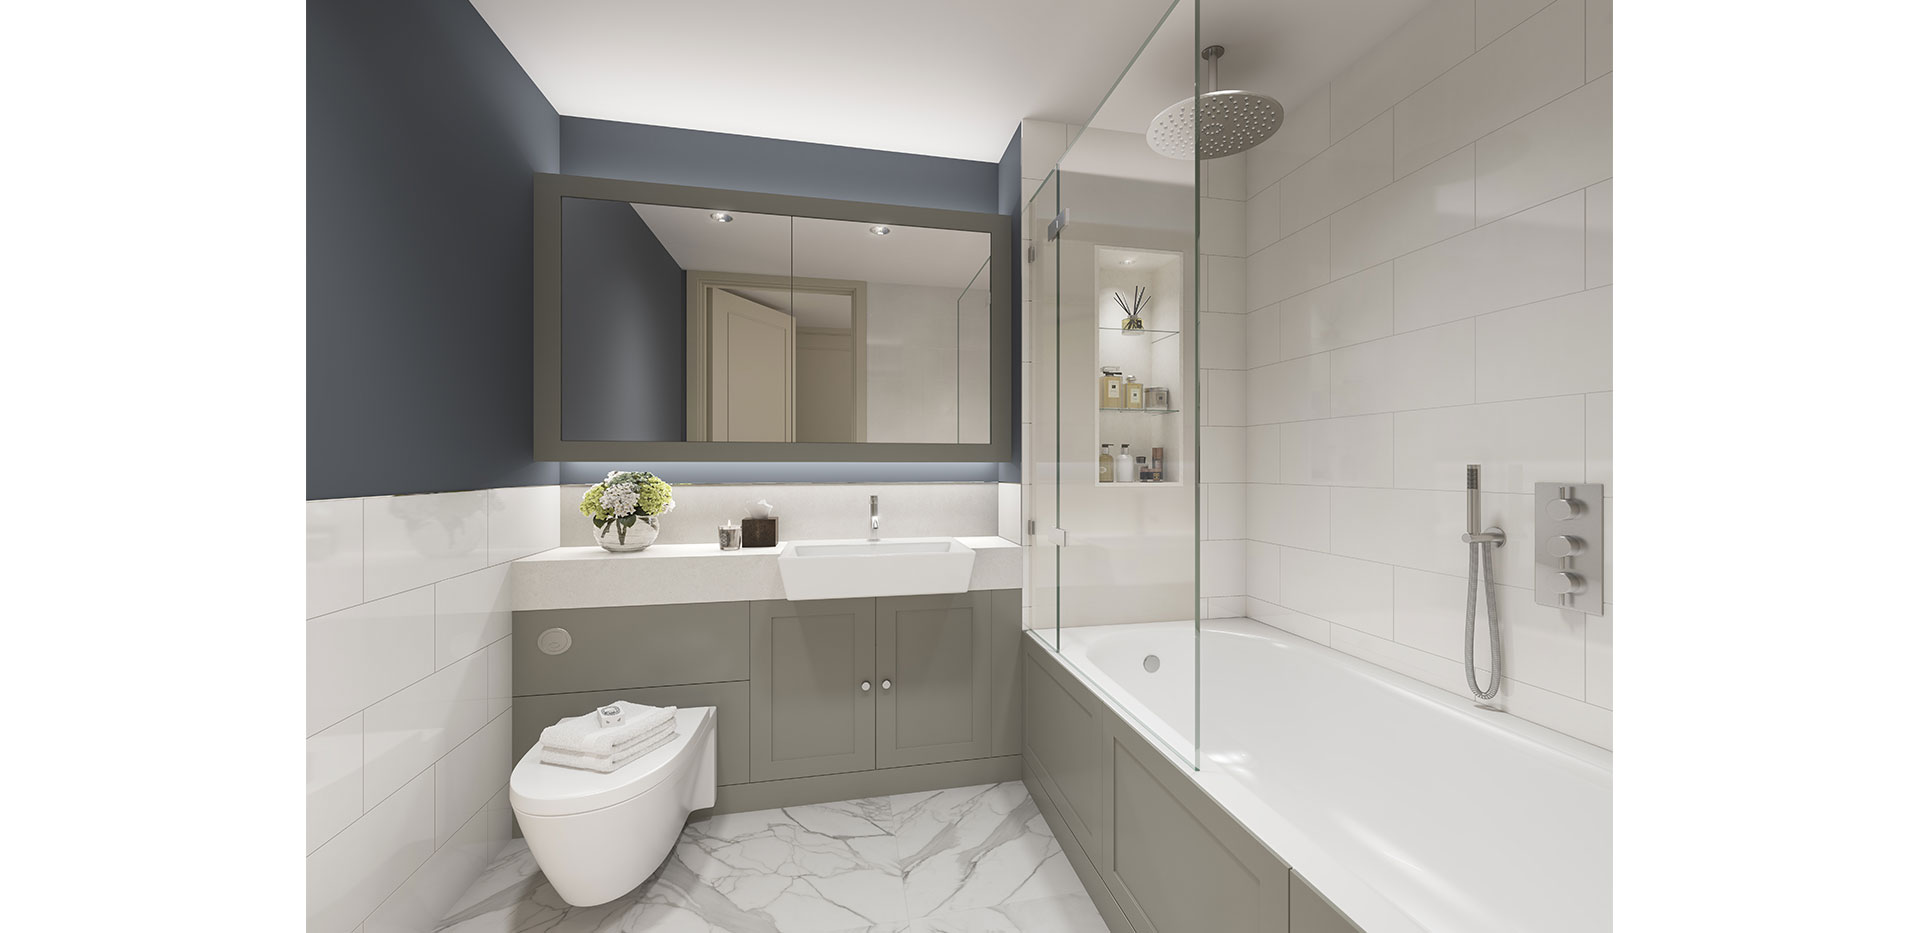 Berkeley, Chiswick Gate, Interior, Bathroom